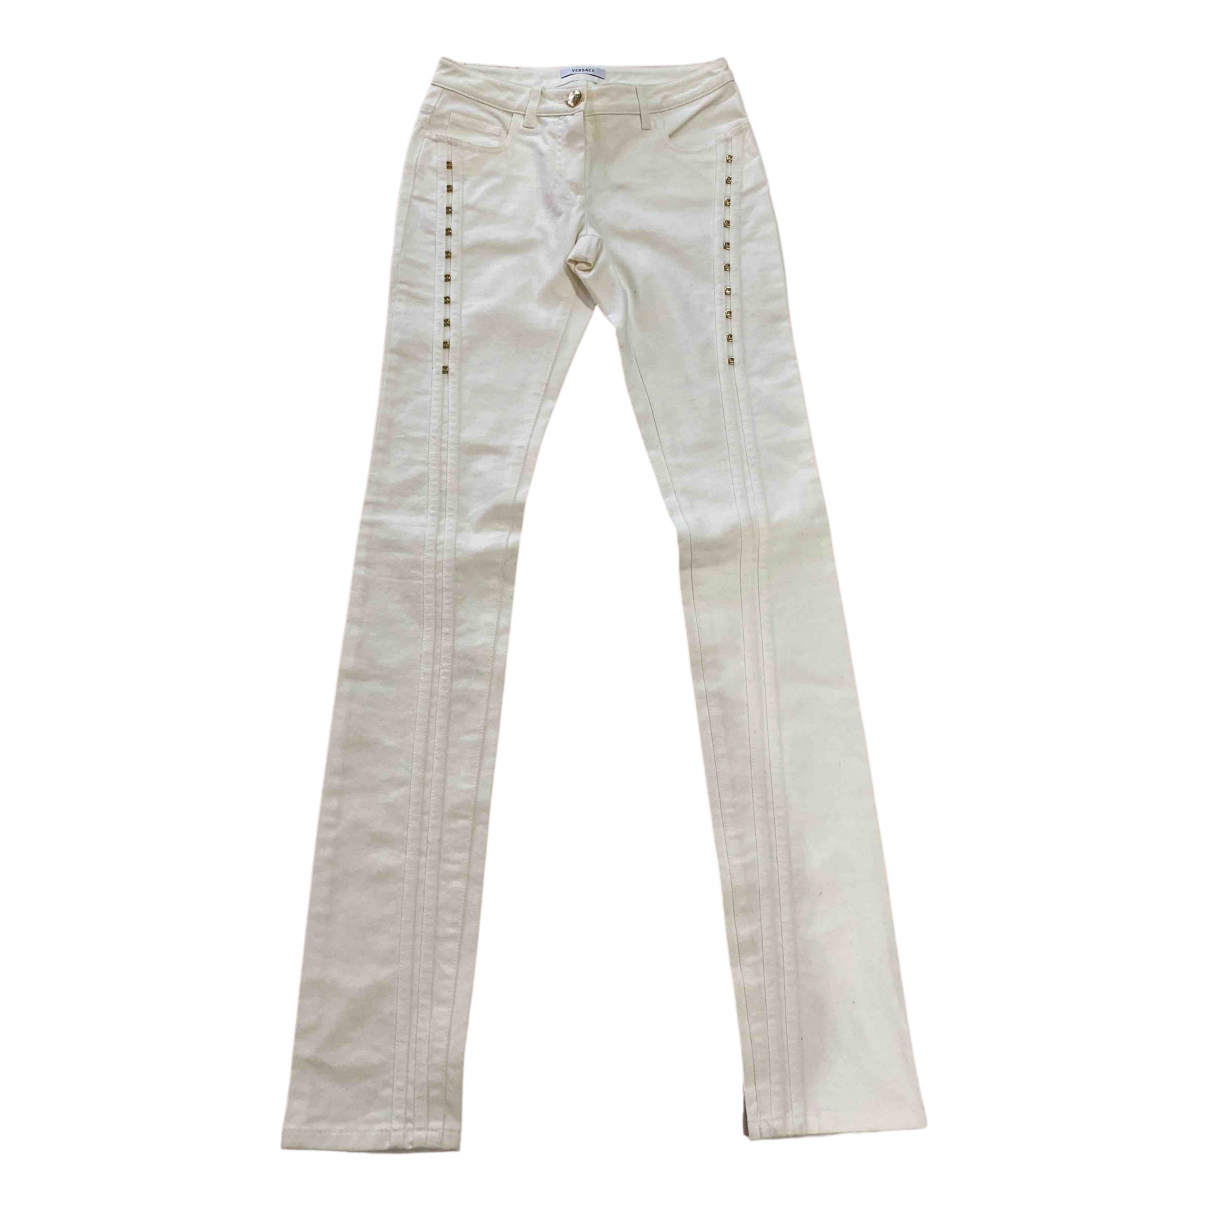 Versace \N White Denim - Jeans Trousers for Women 36 IT